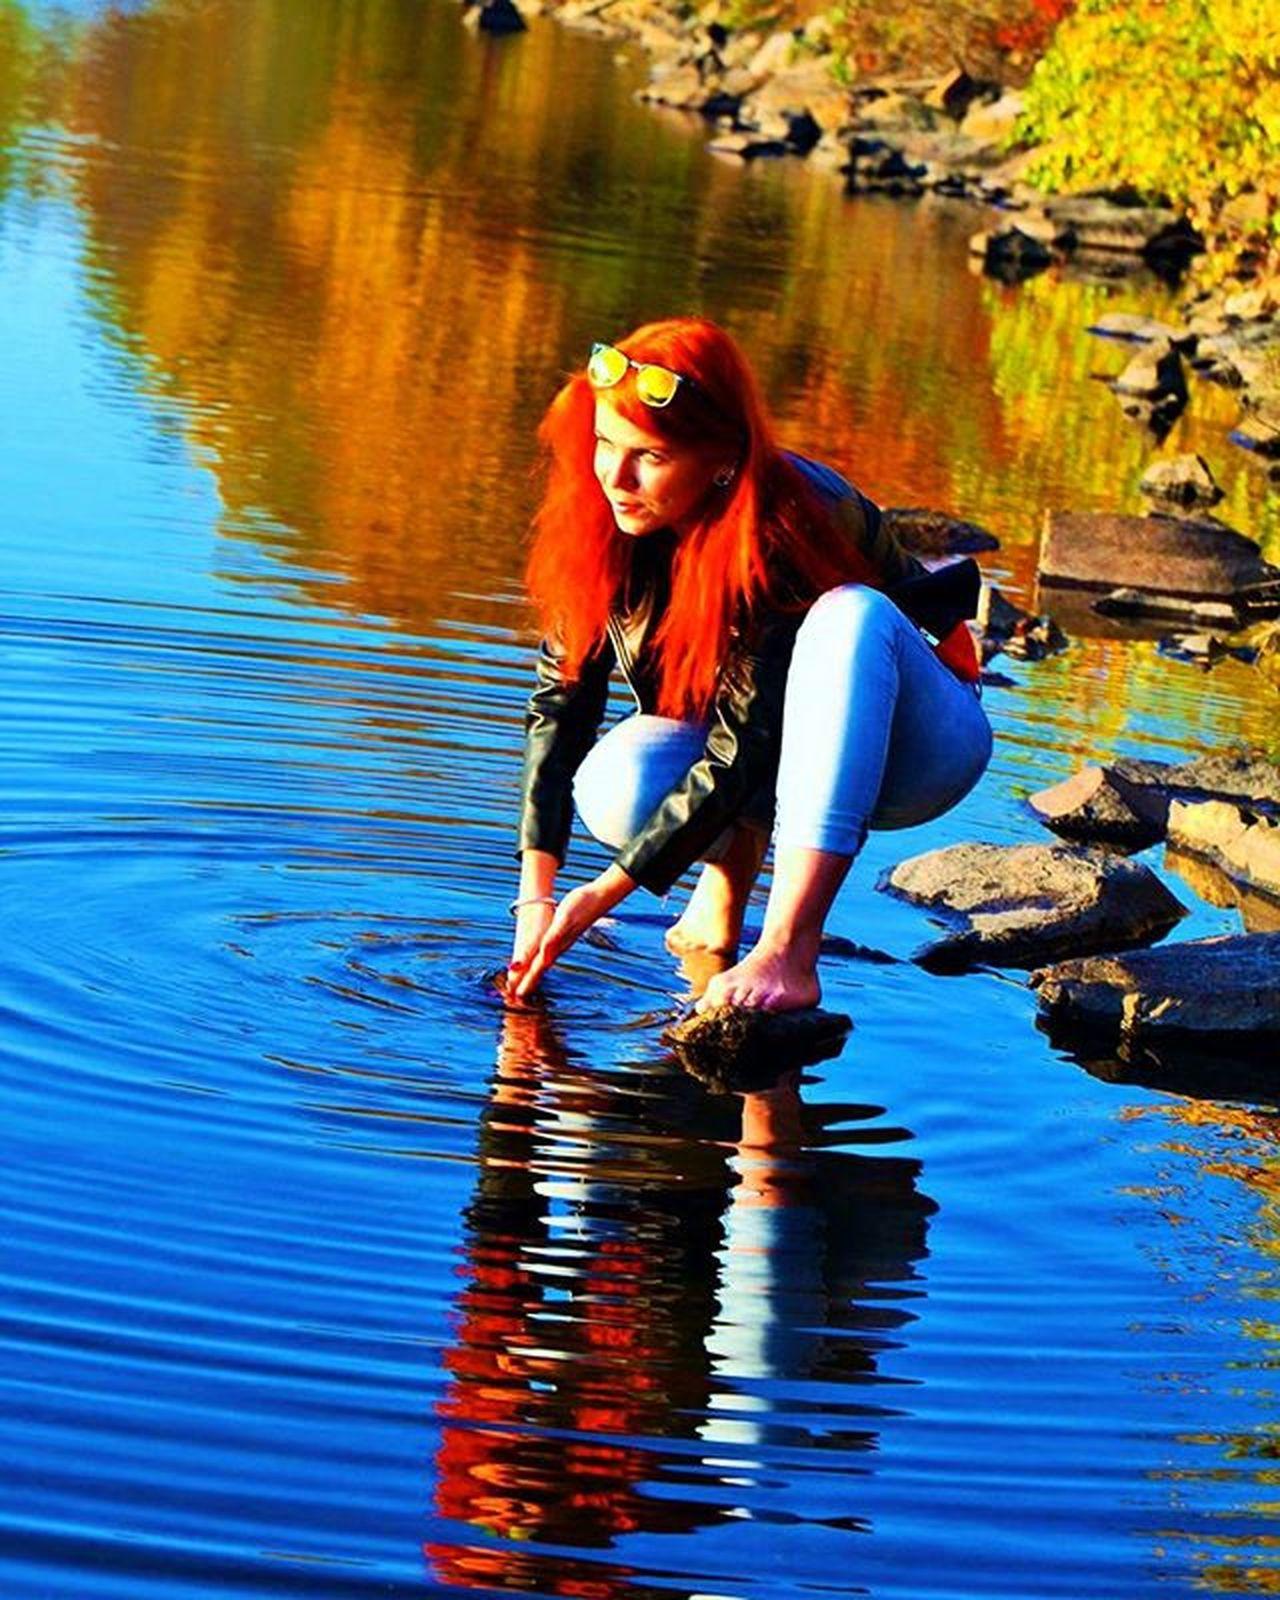 Lake Autumn Nature Slovakia Košice Water Picoftheday Photooftheday Redhair Sunset Sun Dnescestujem Forest Slovakgirls Compositionkillerz Composition Photo Instagood Smile Thisisslovakia Naturelovers Passionpassport Rayban